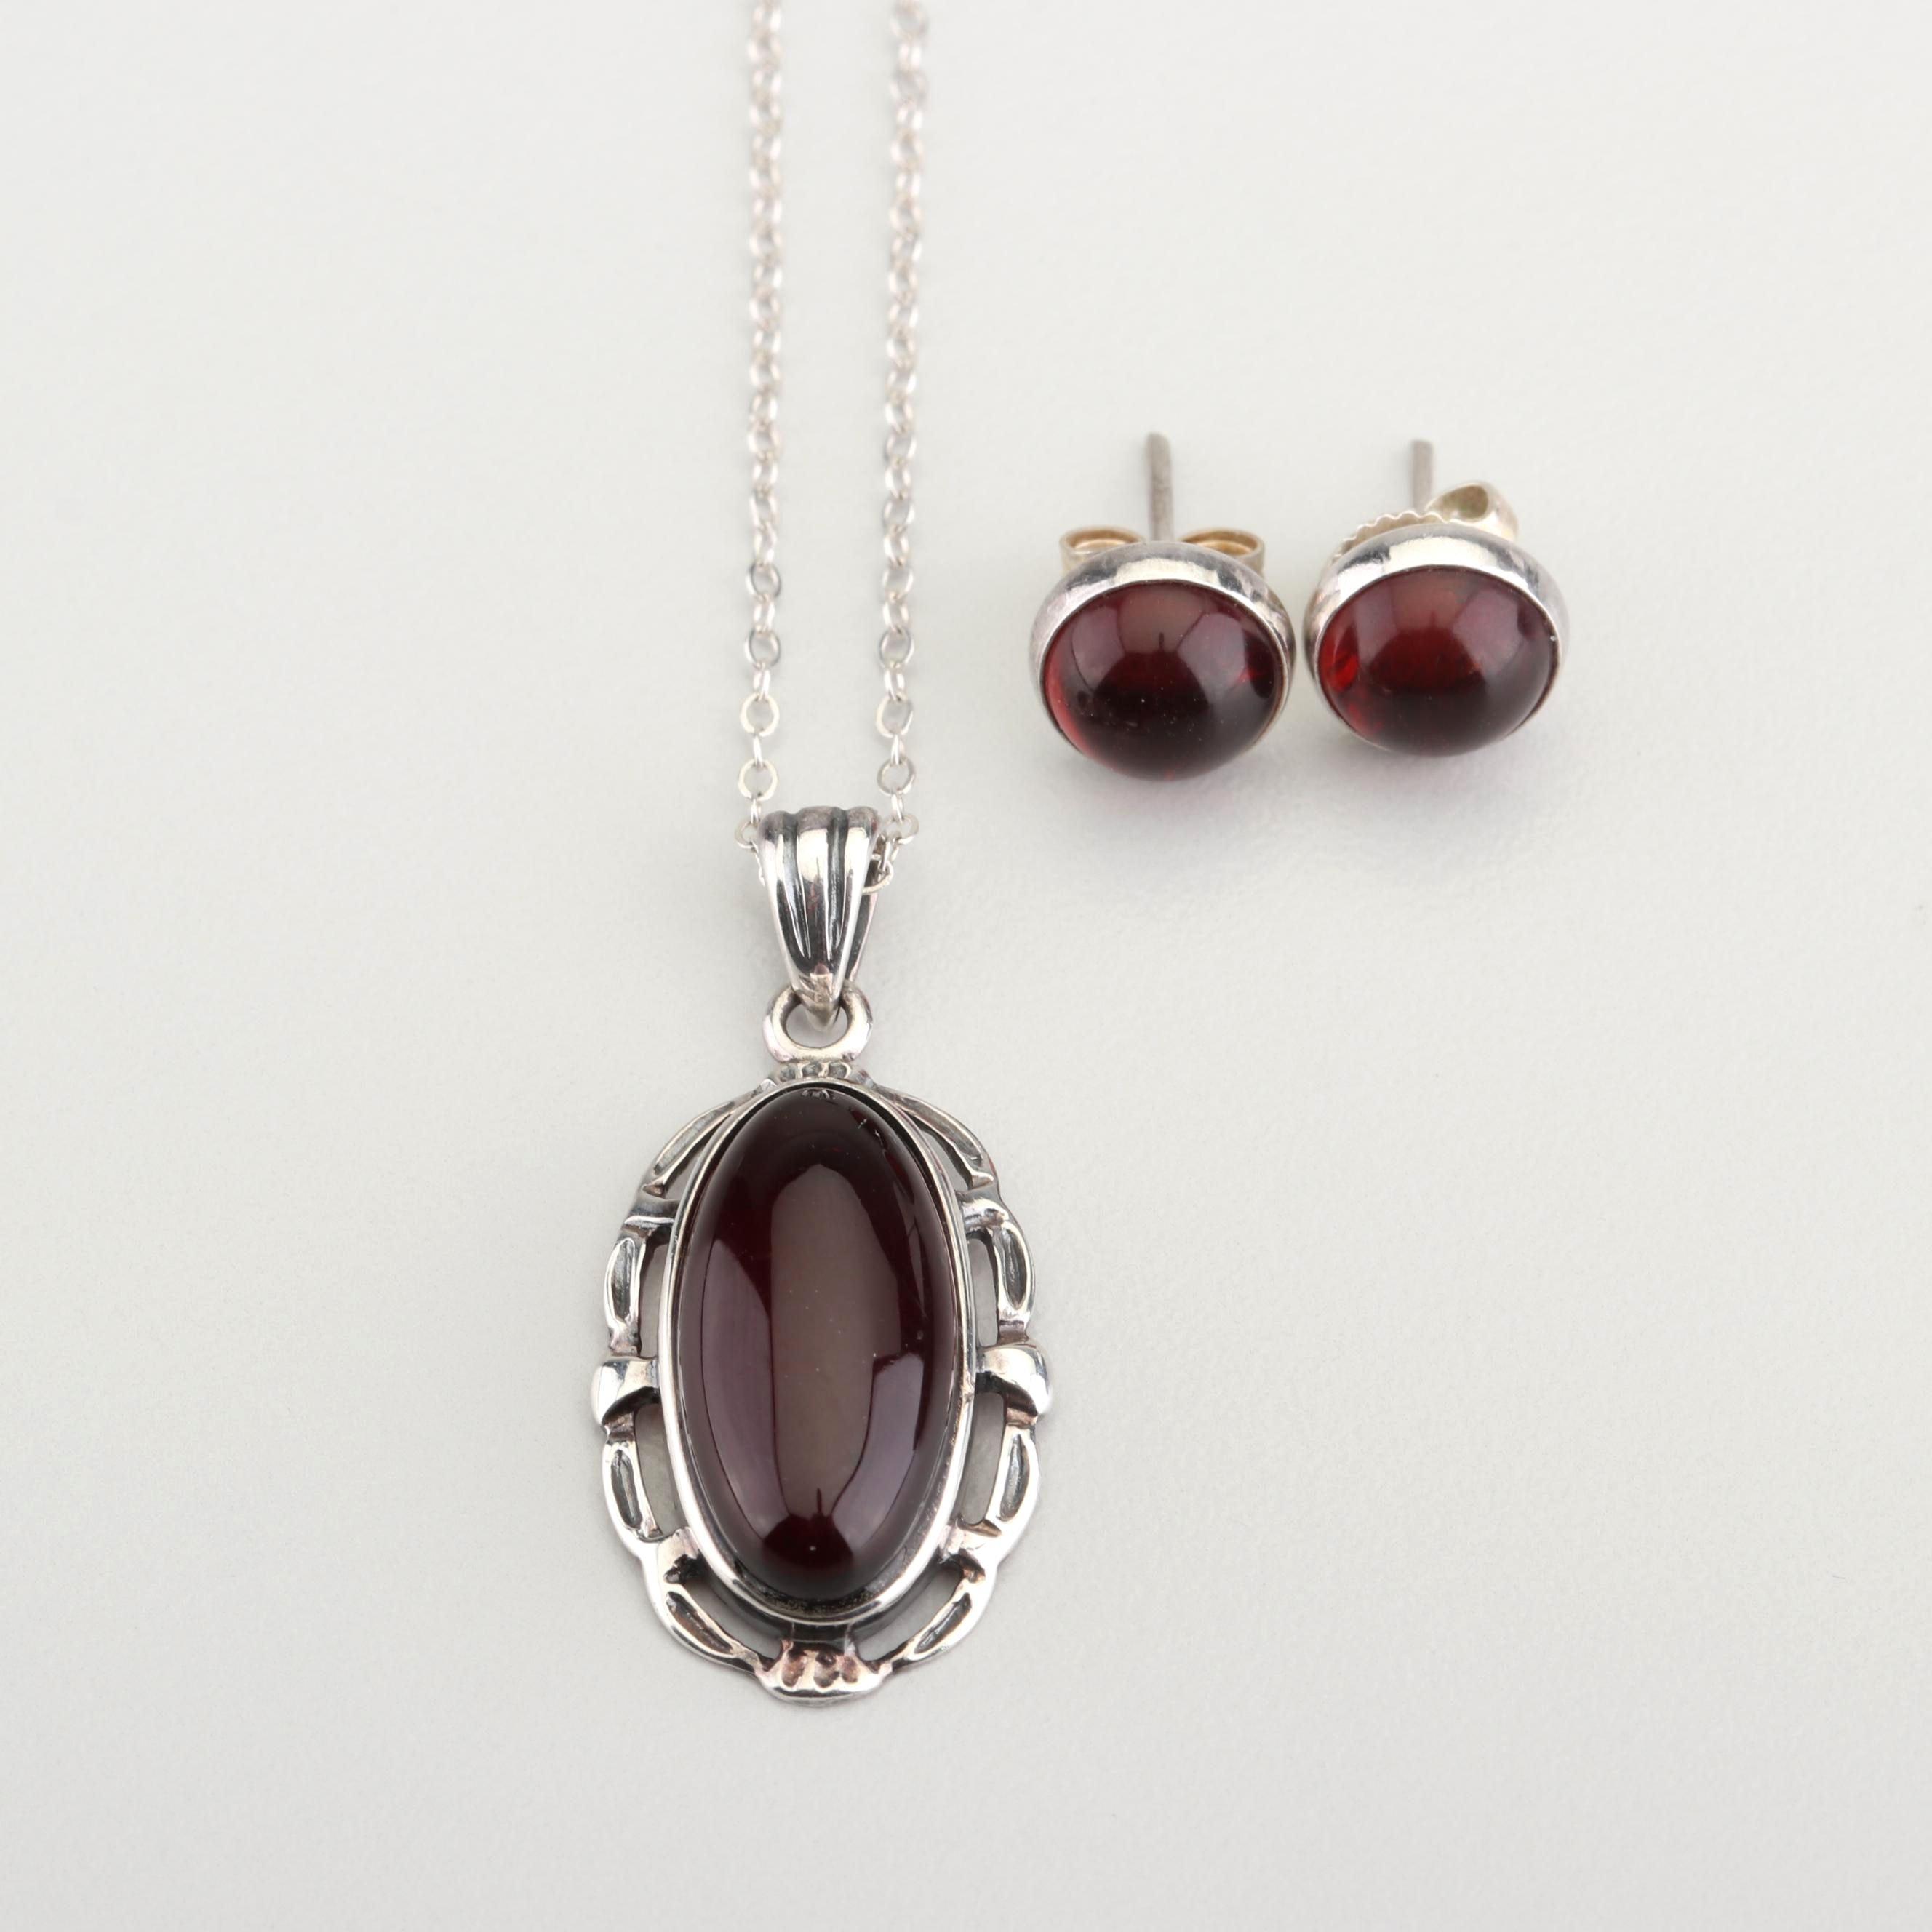 Sterling Silver Almandite Garnet Necklace and Earrings